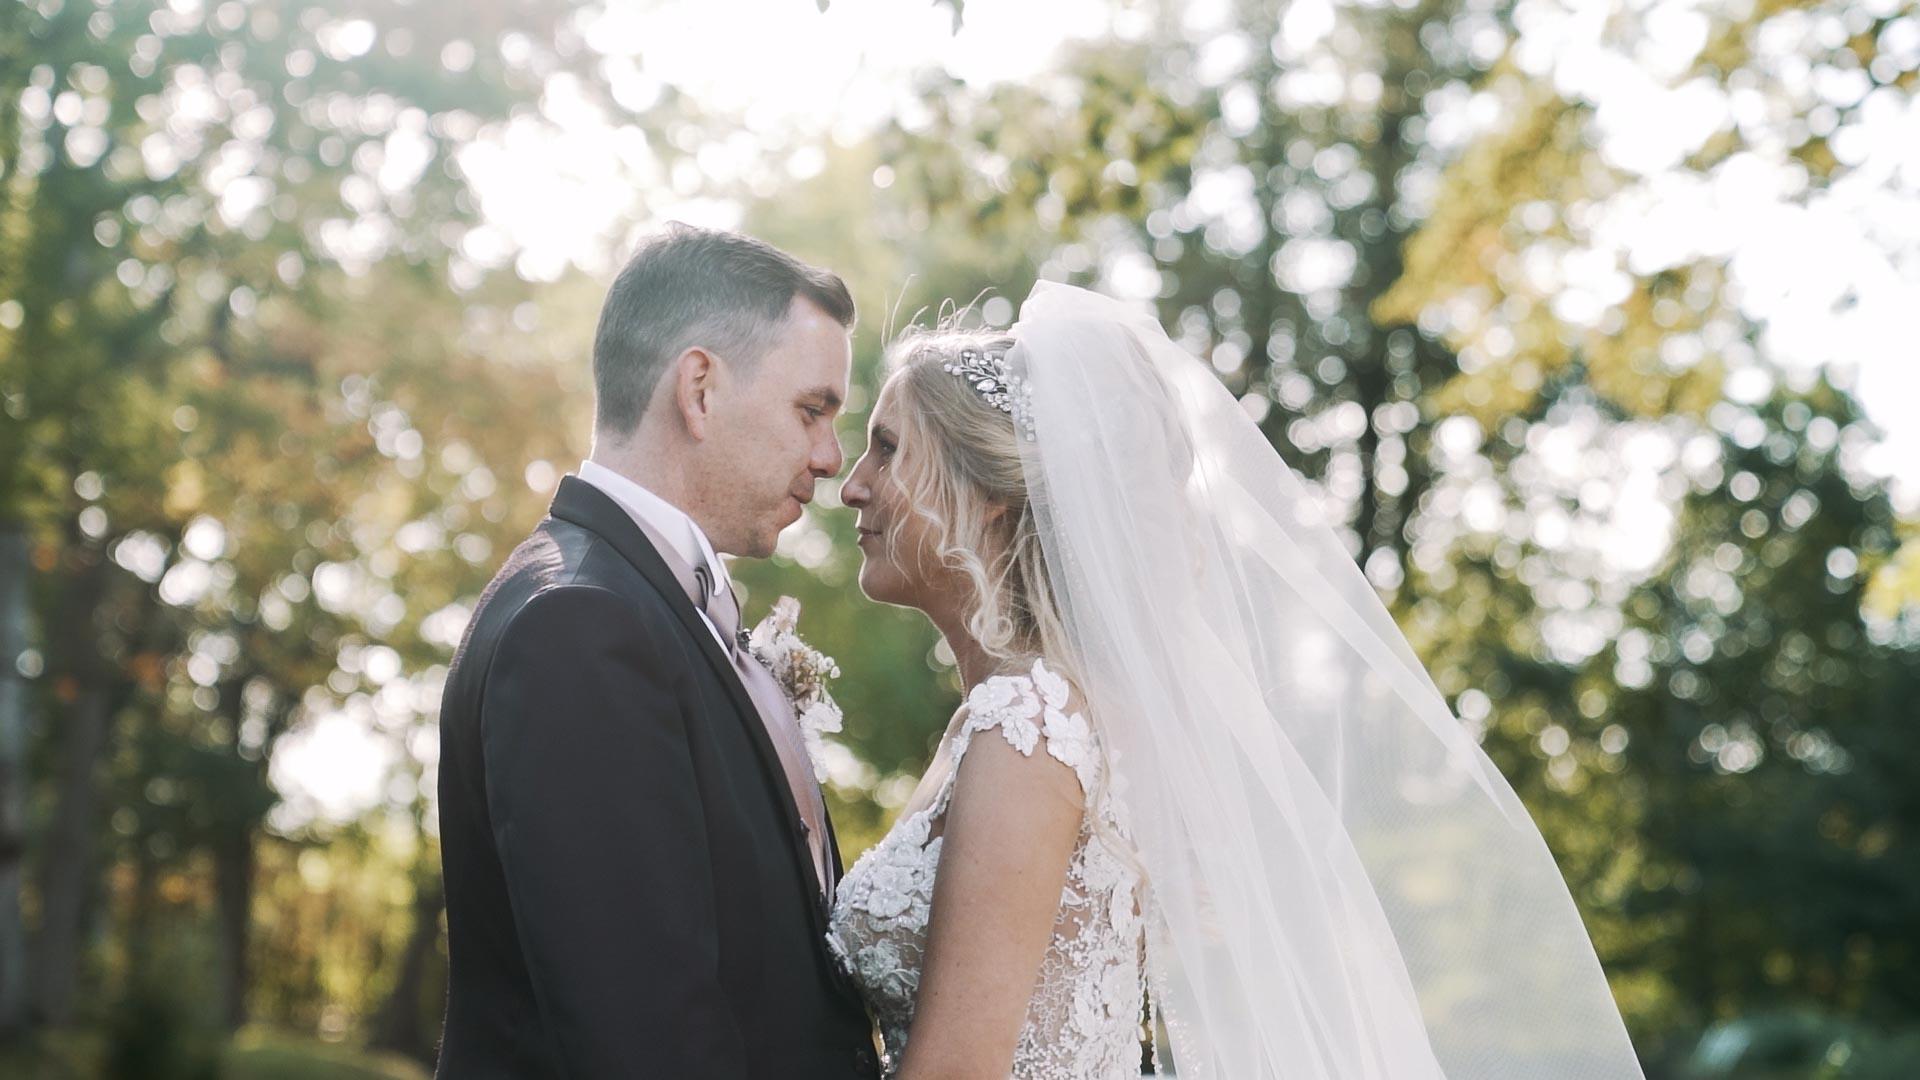 Pascal & Jenny Hochzeitsfilm Schloss Vettelhoven Videograf Hochzeit Filmemacher 005